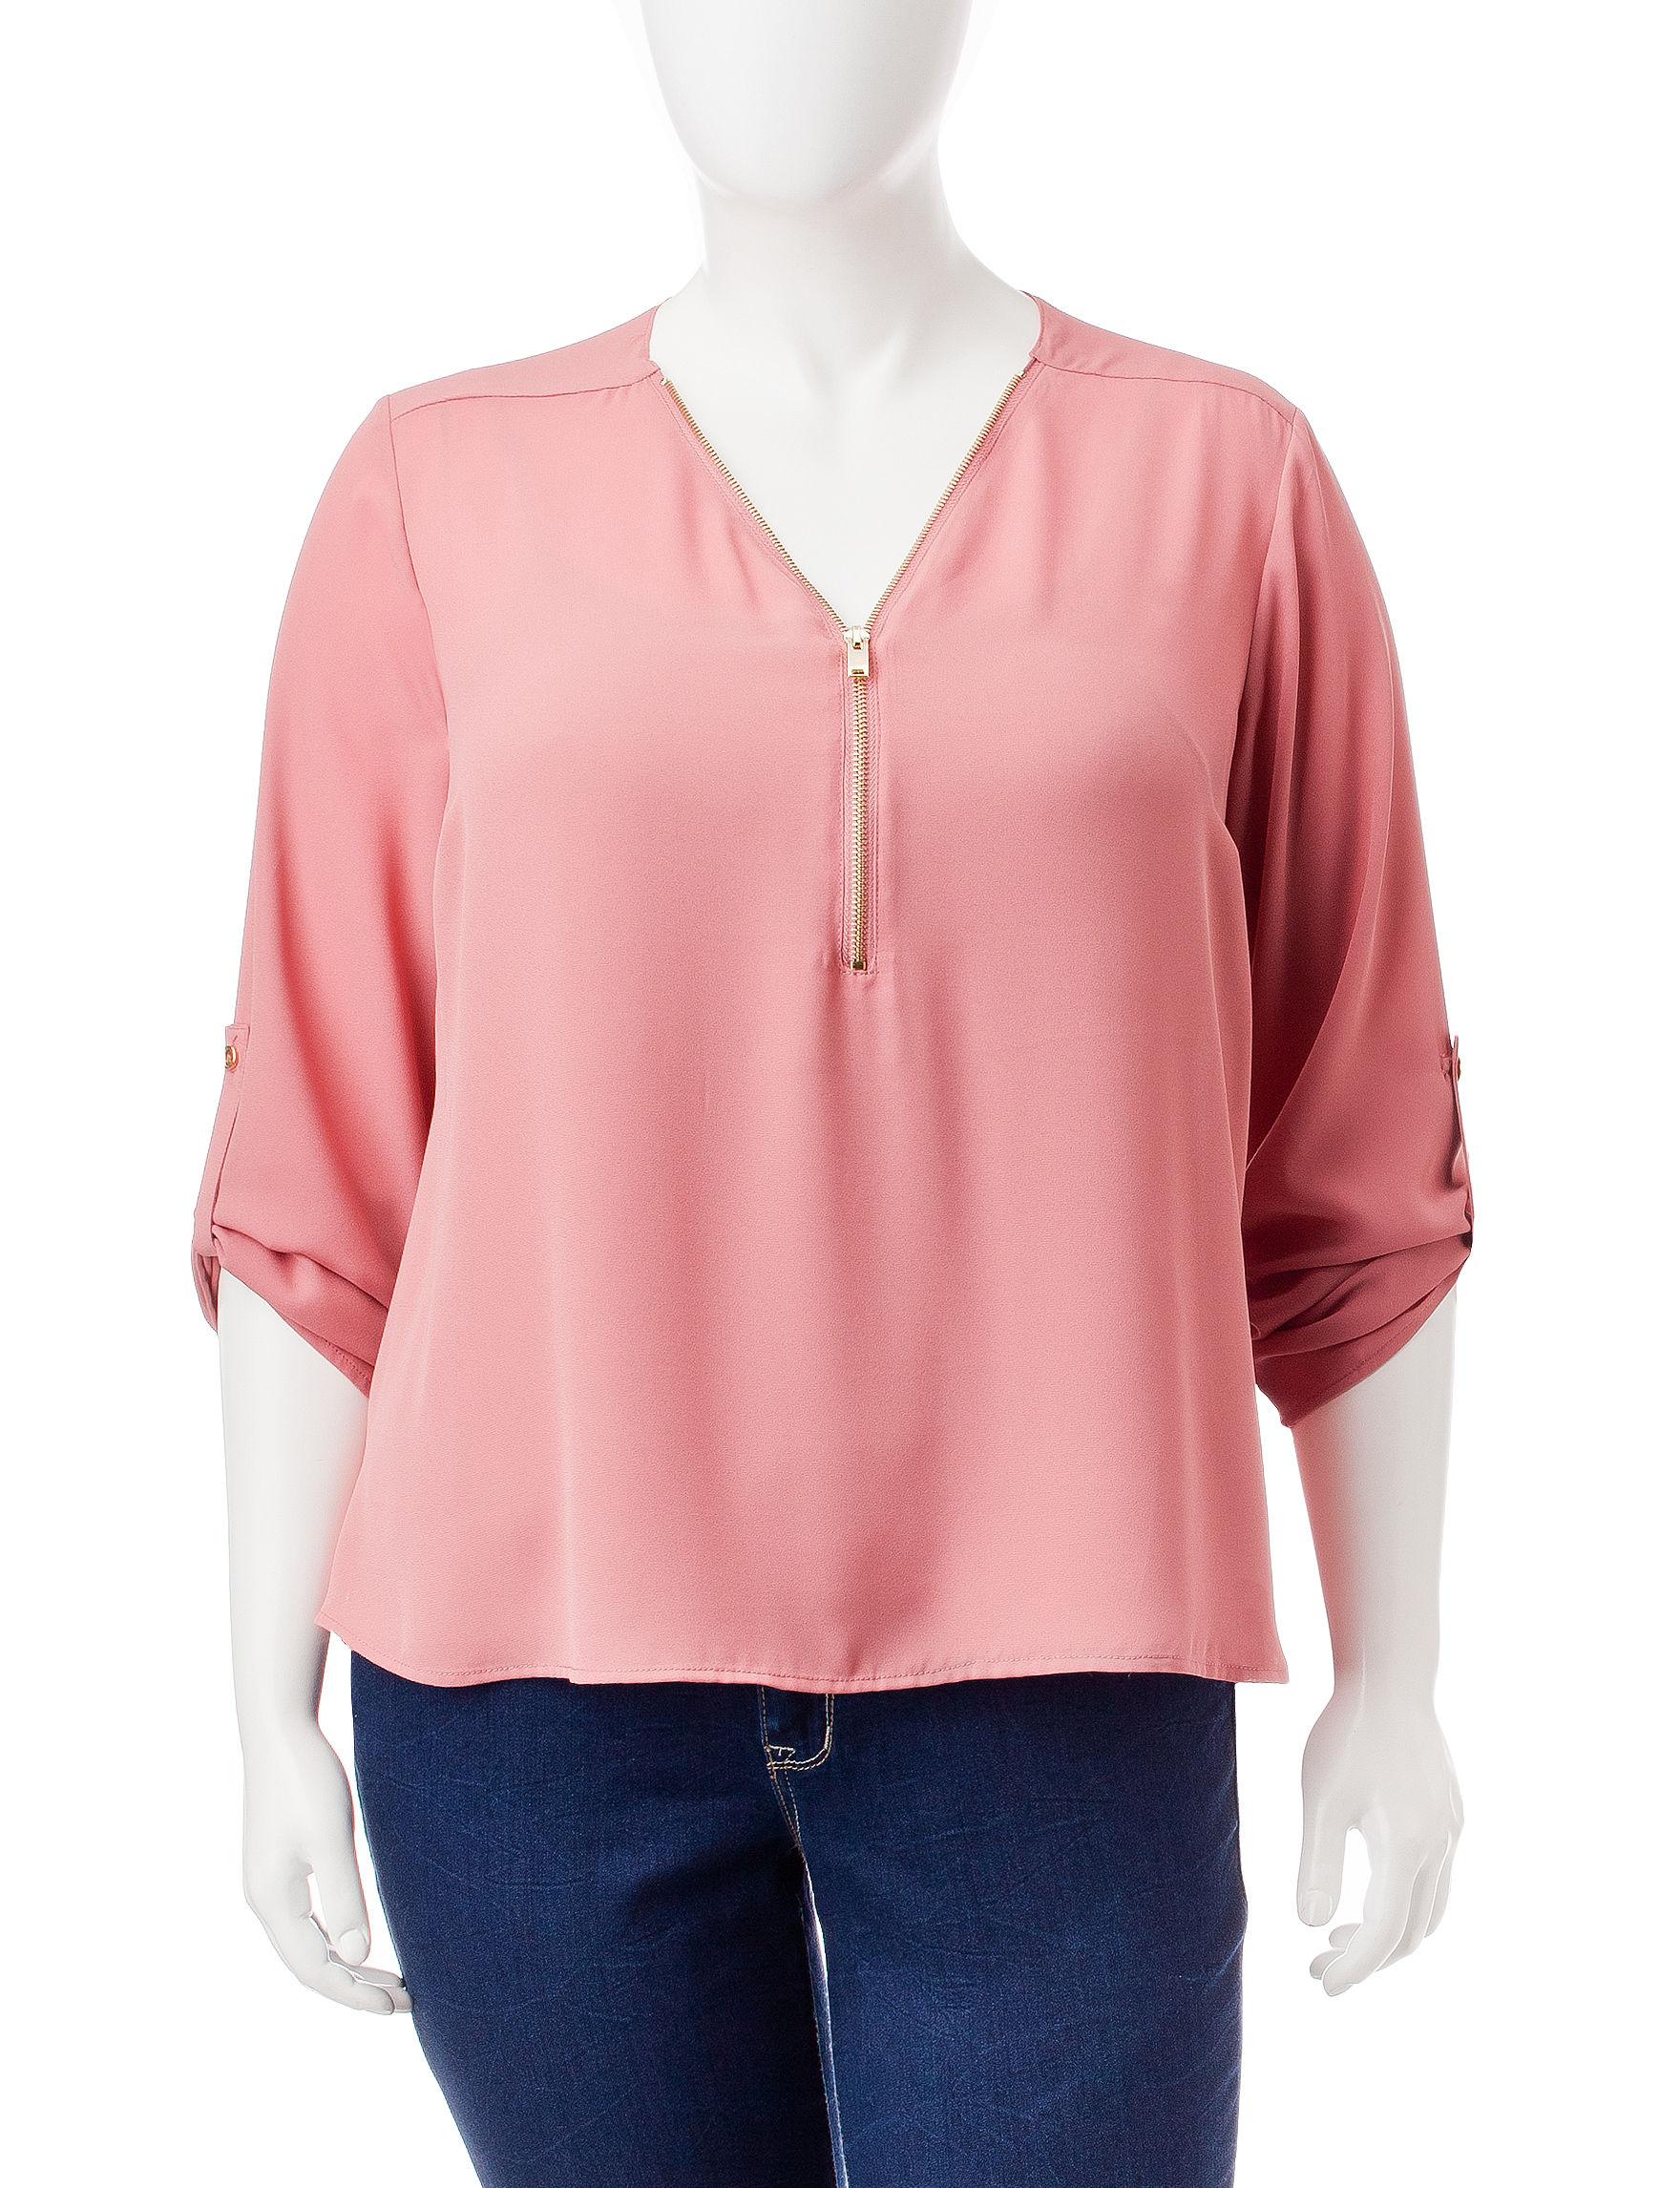 Justify Dark Pink Shirts & Blouses